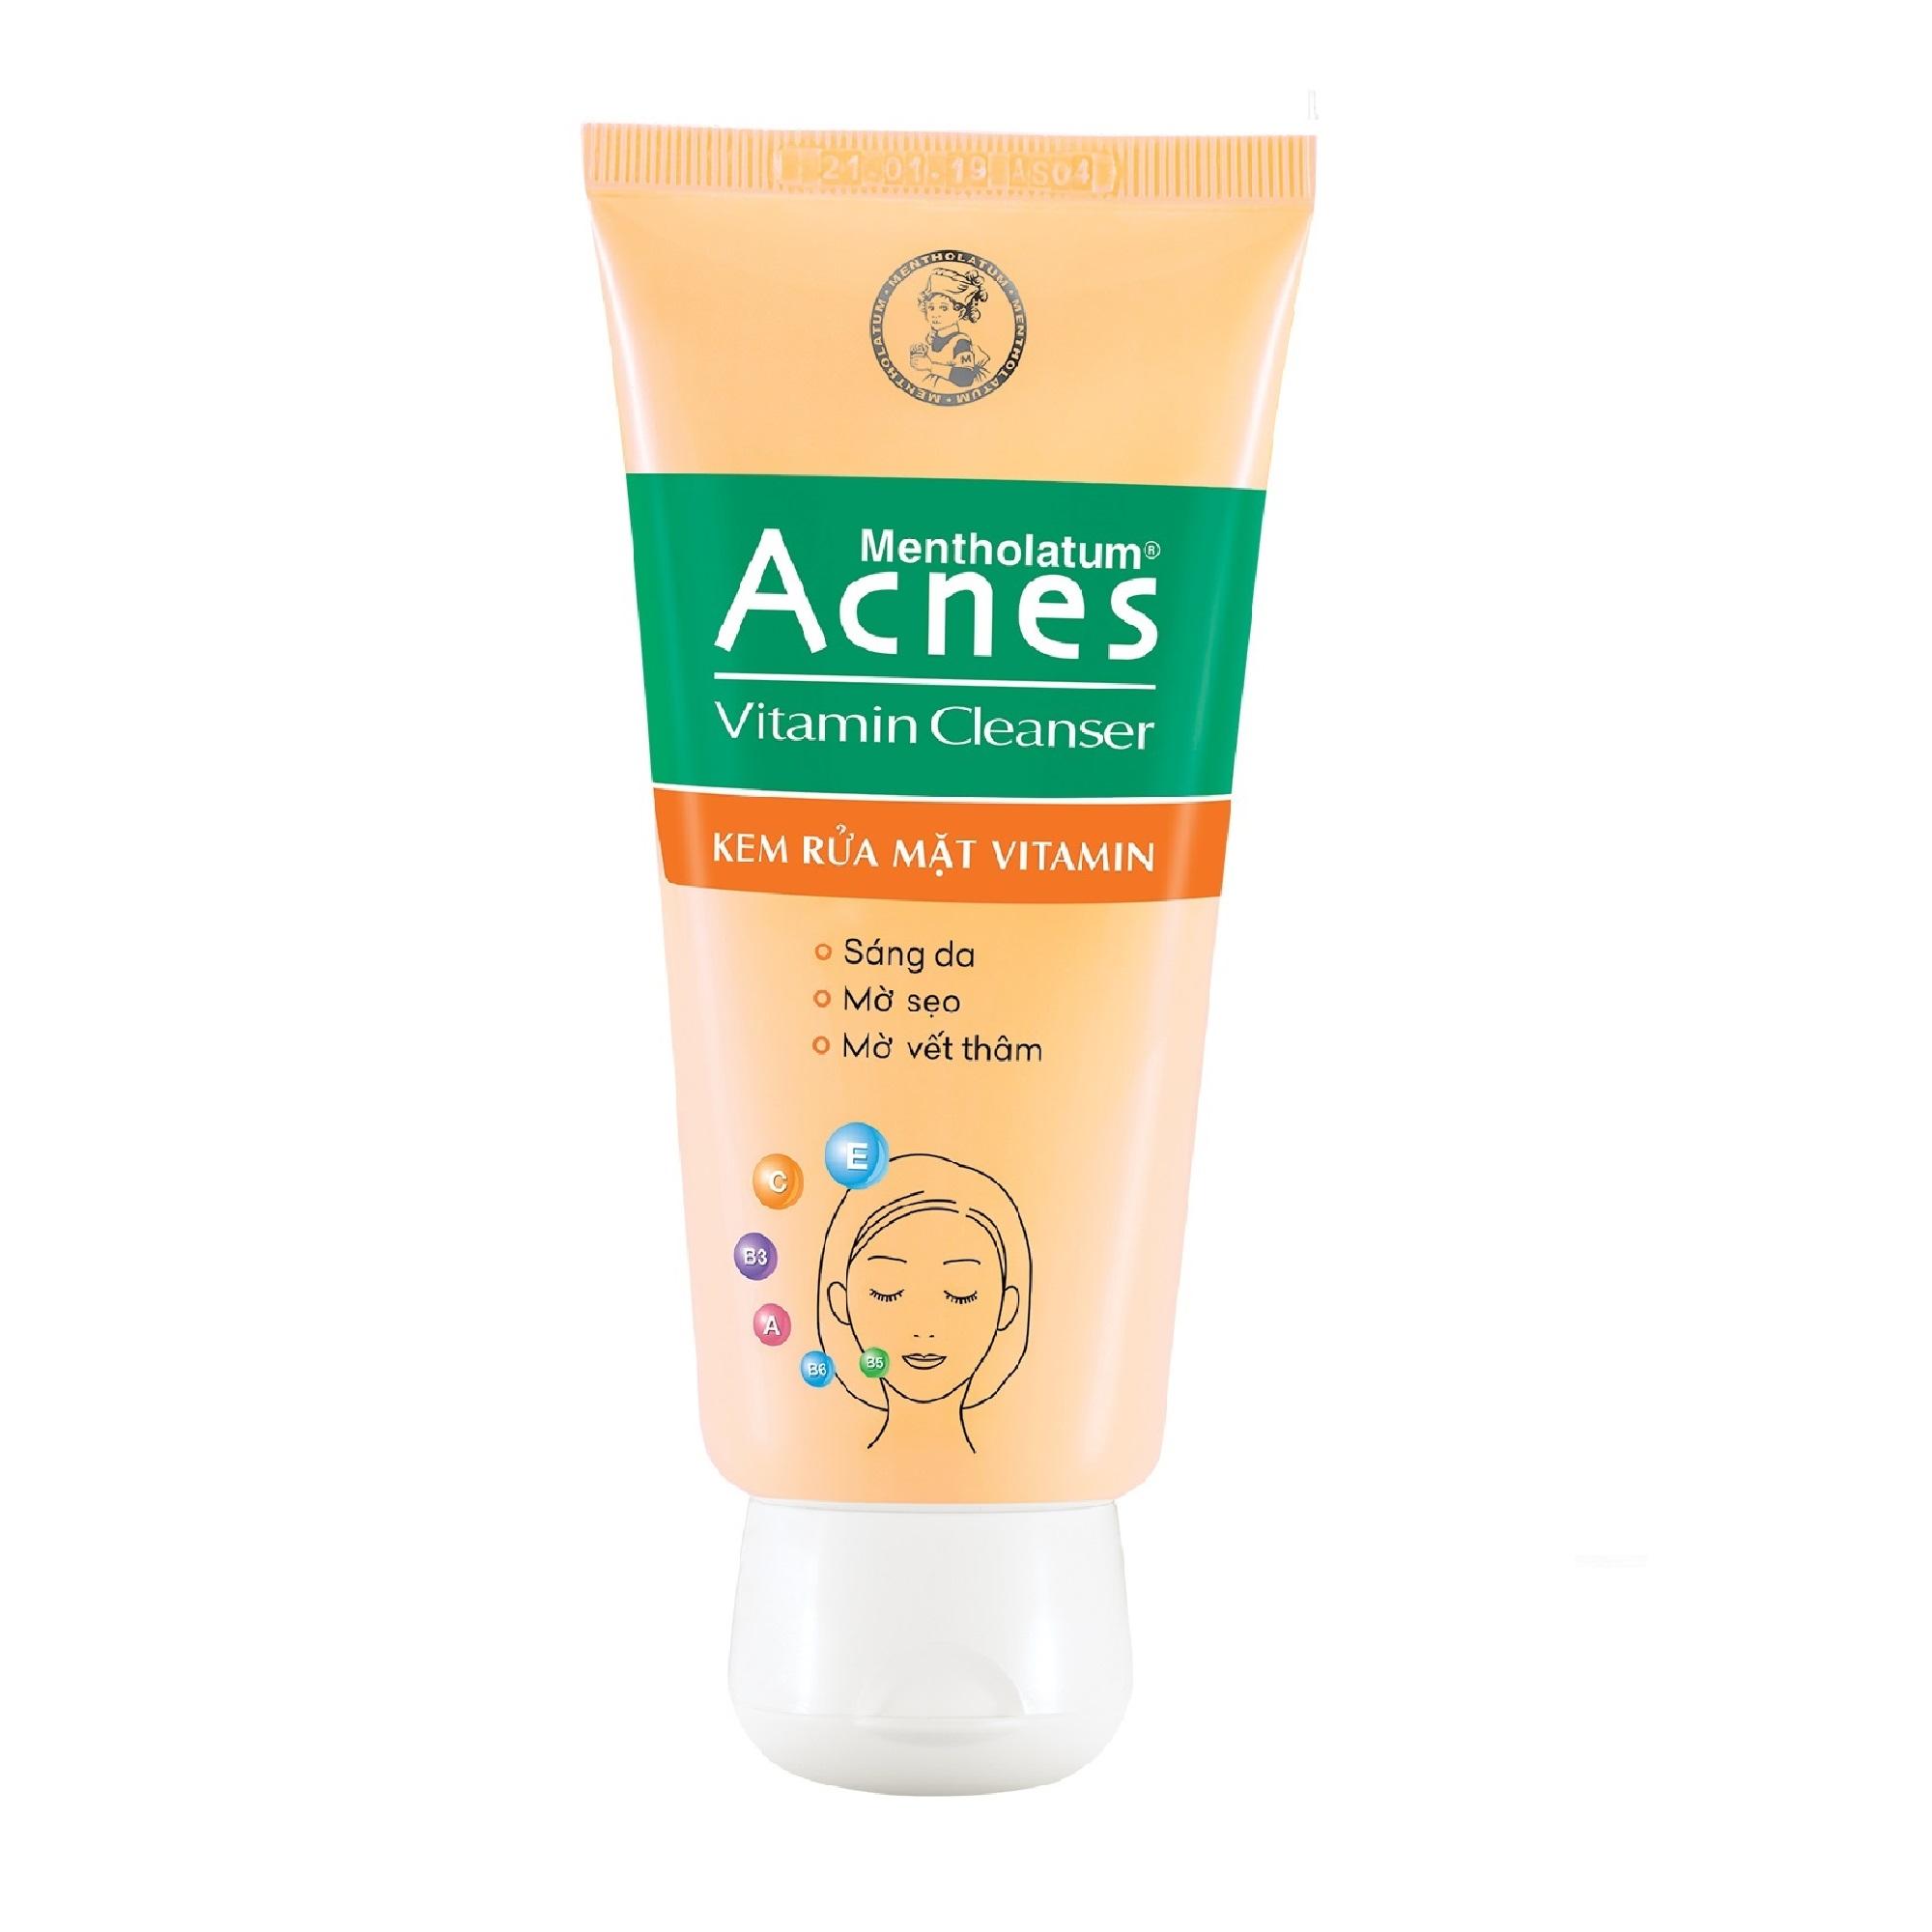 Kem rửa mặt Vitamin Acnes Vitamin Cleanser 100g - 1353433 , 2983274976203 , 62_10863053 , 59000 , Kem-rua-mat-Vitamin-Acnes-Vitamin-Cleanser-100g-62_10863053 , tiki.vn , Kem rửa mặt Vitamin Acnes Vitamin Cleanser 100g